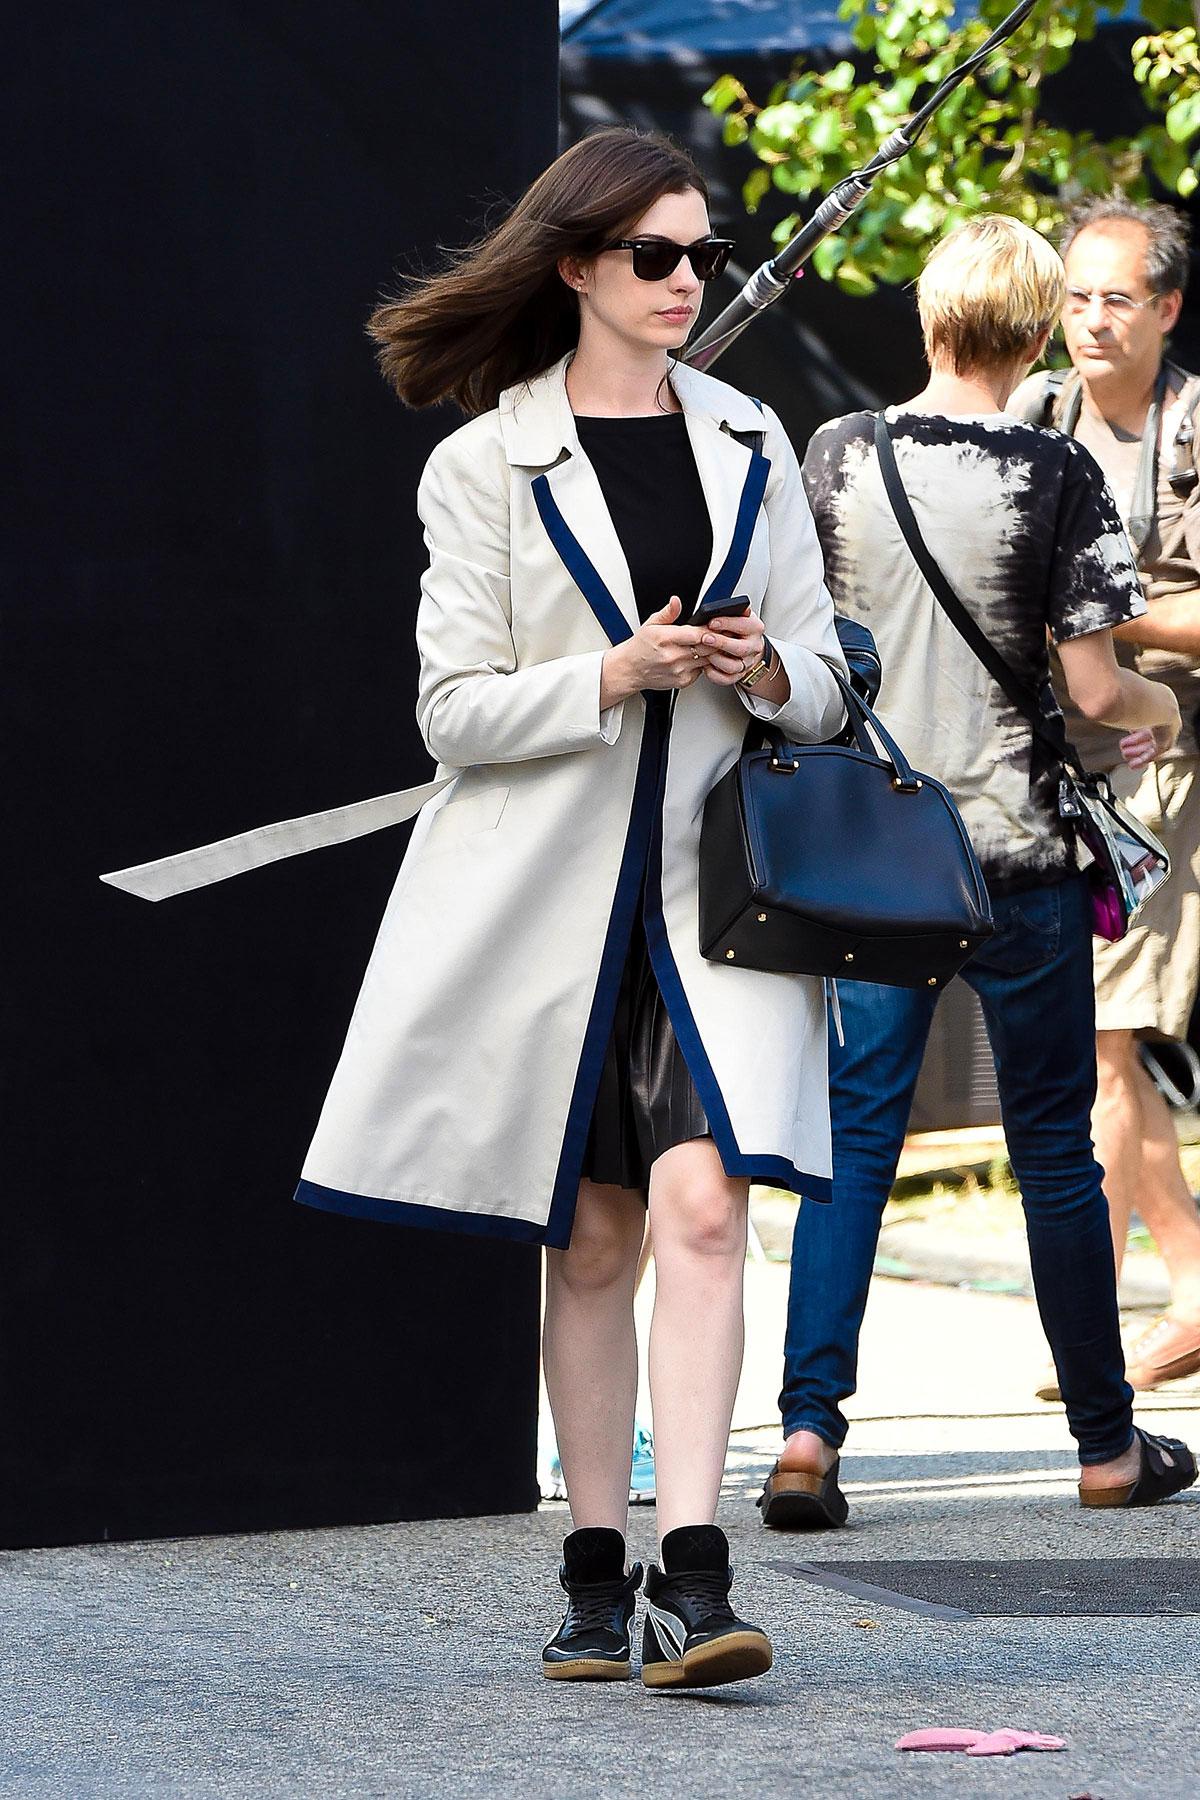 Anne Hathaway The Intern set candids in NYC